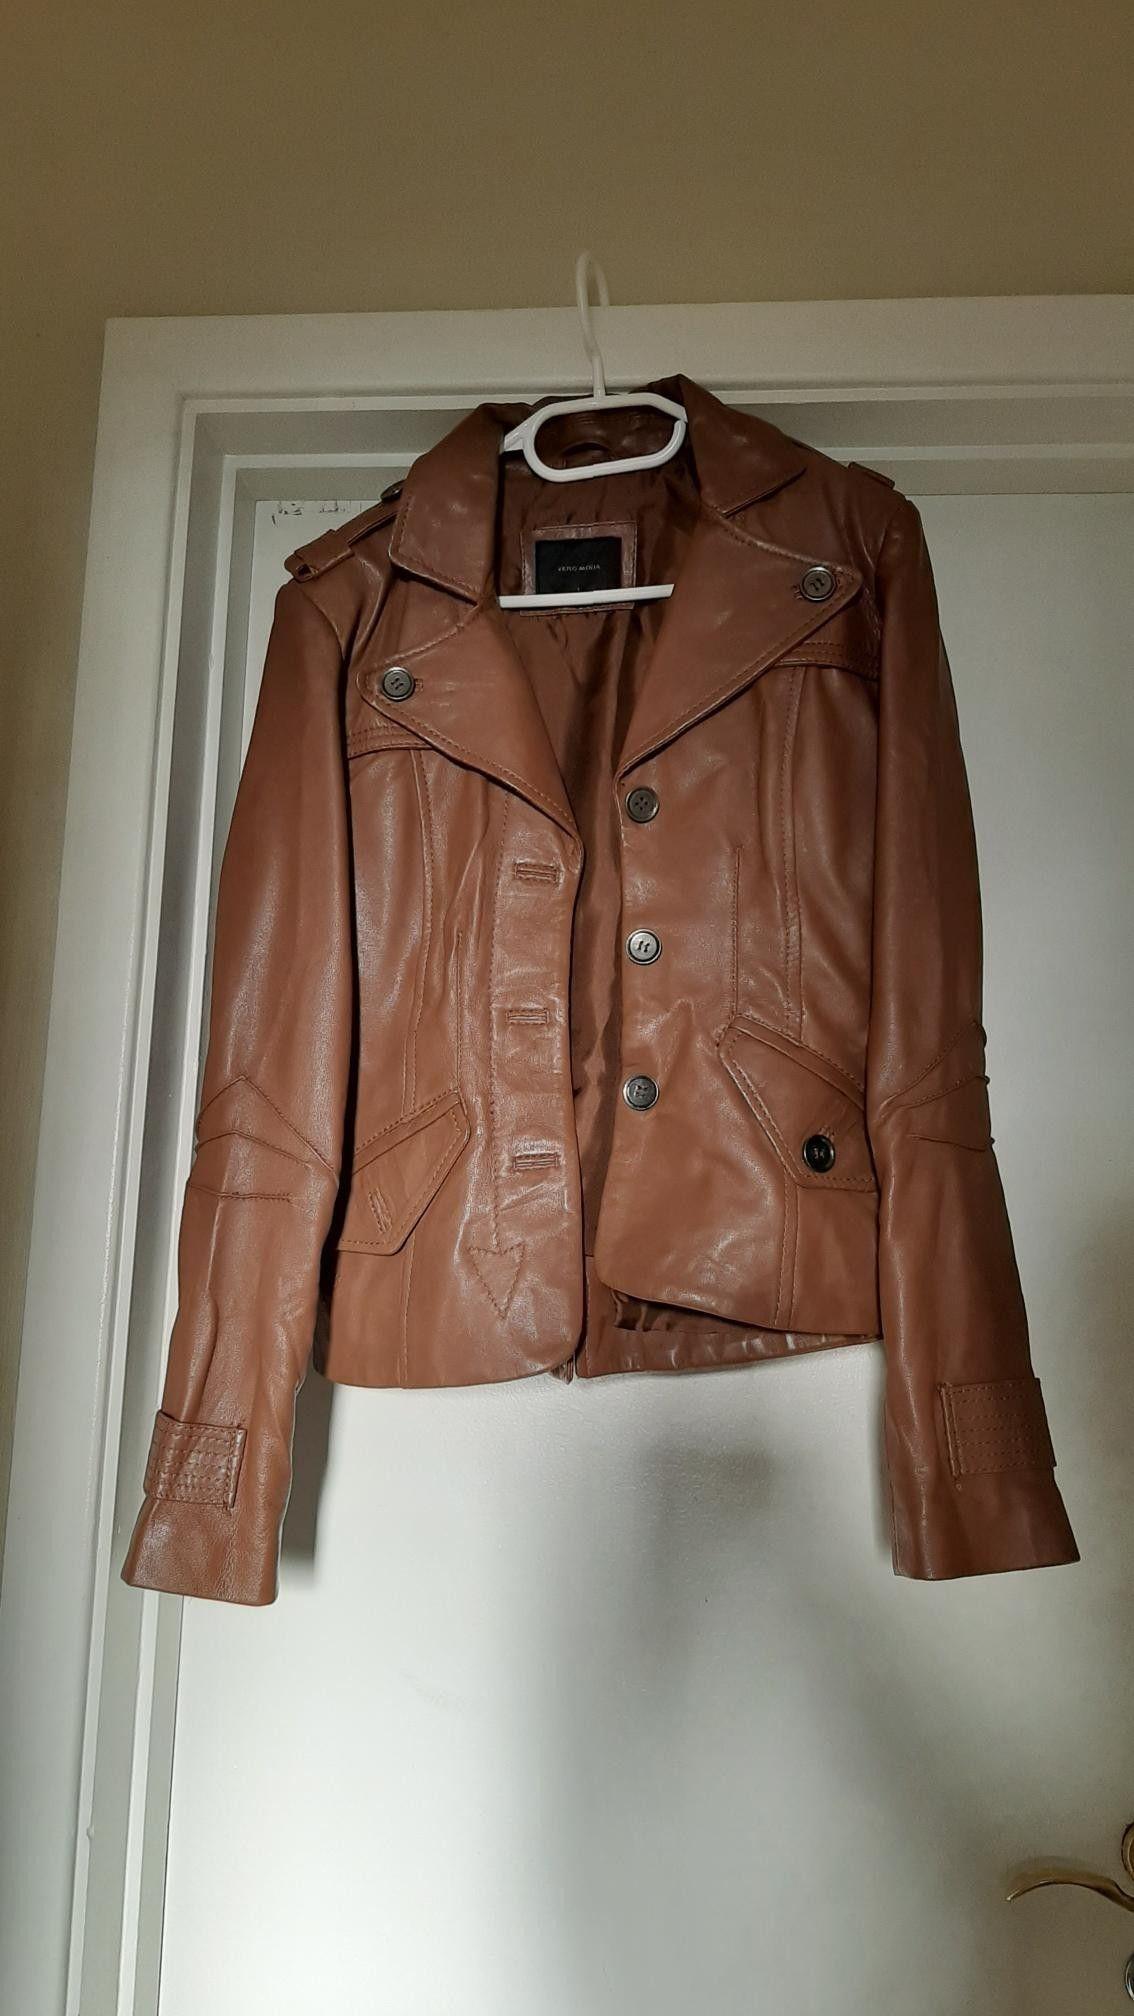 Skinnjakker jakker (nesten ny) | FINN.no